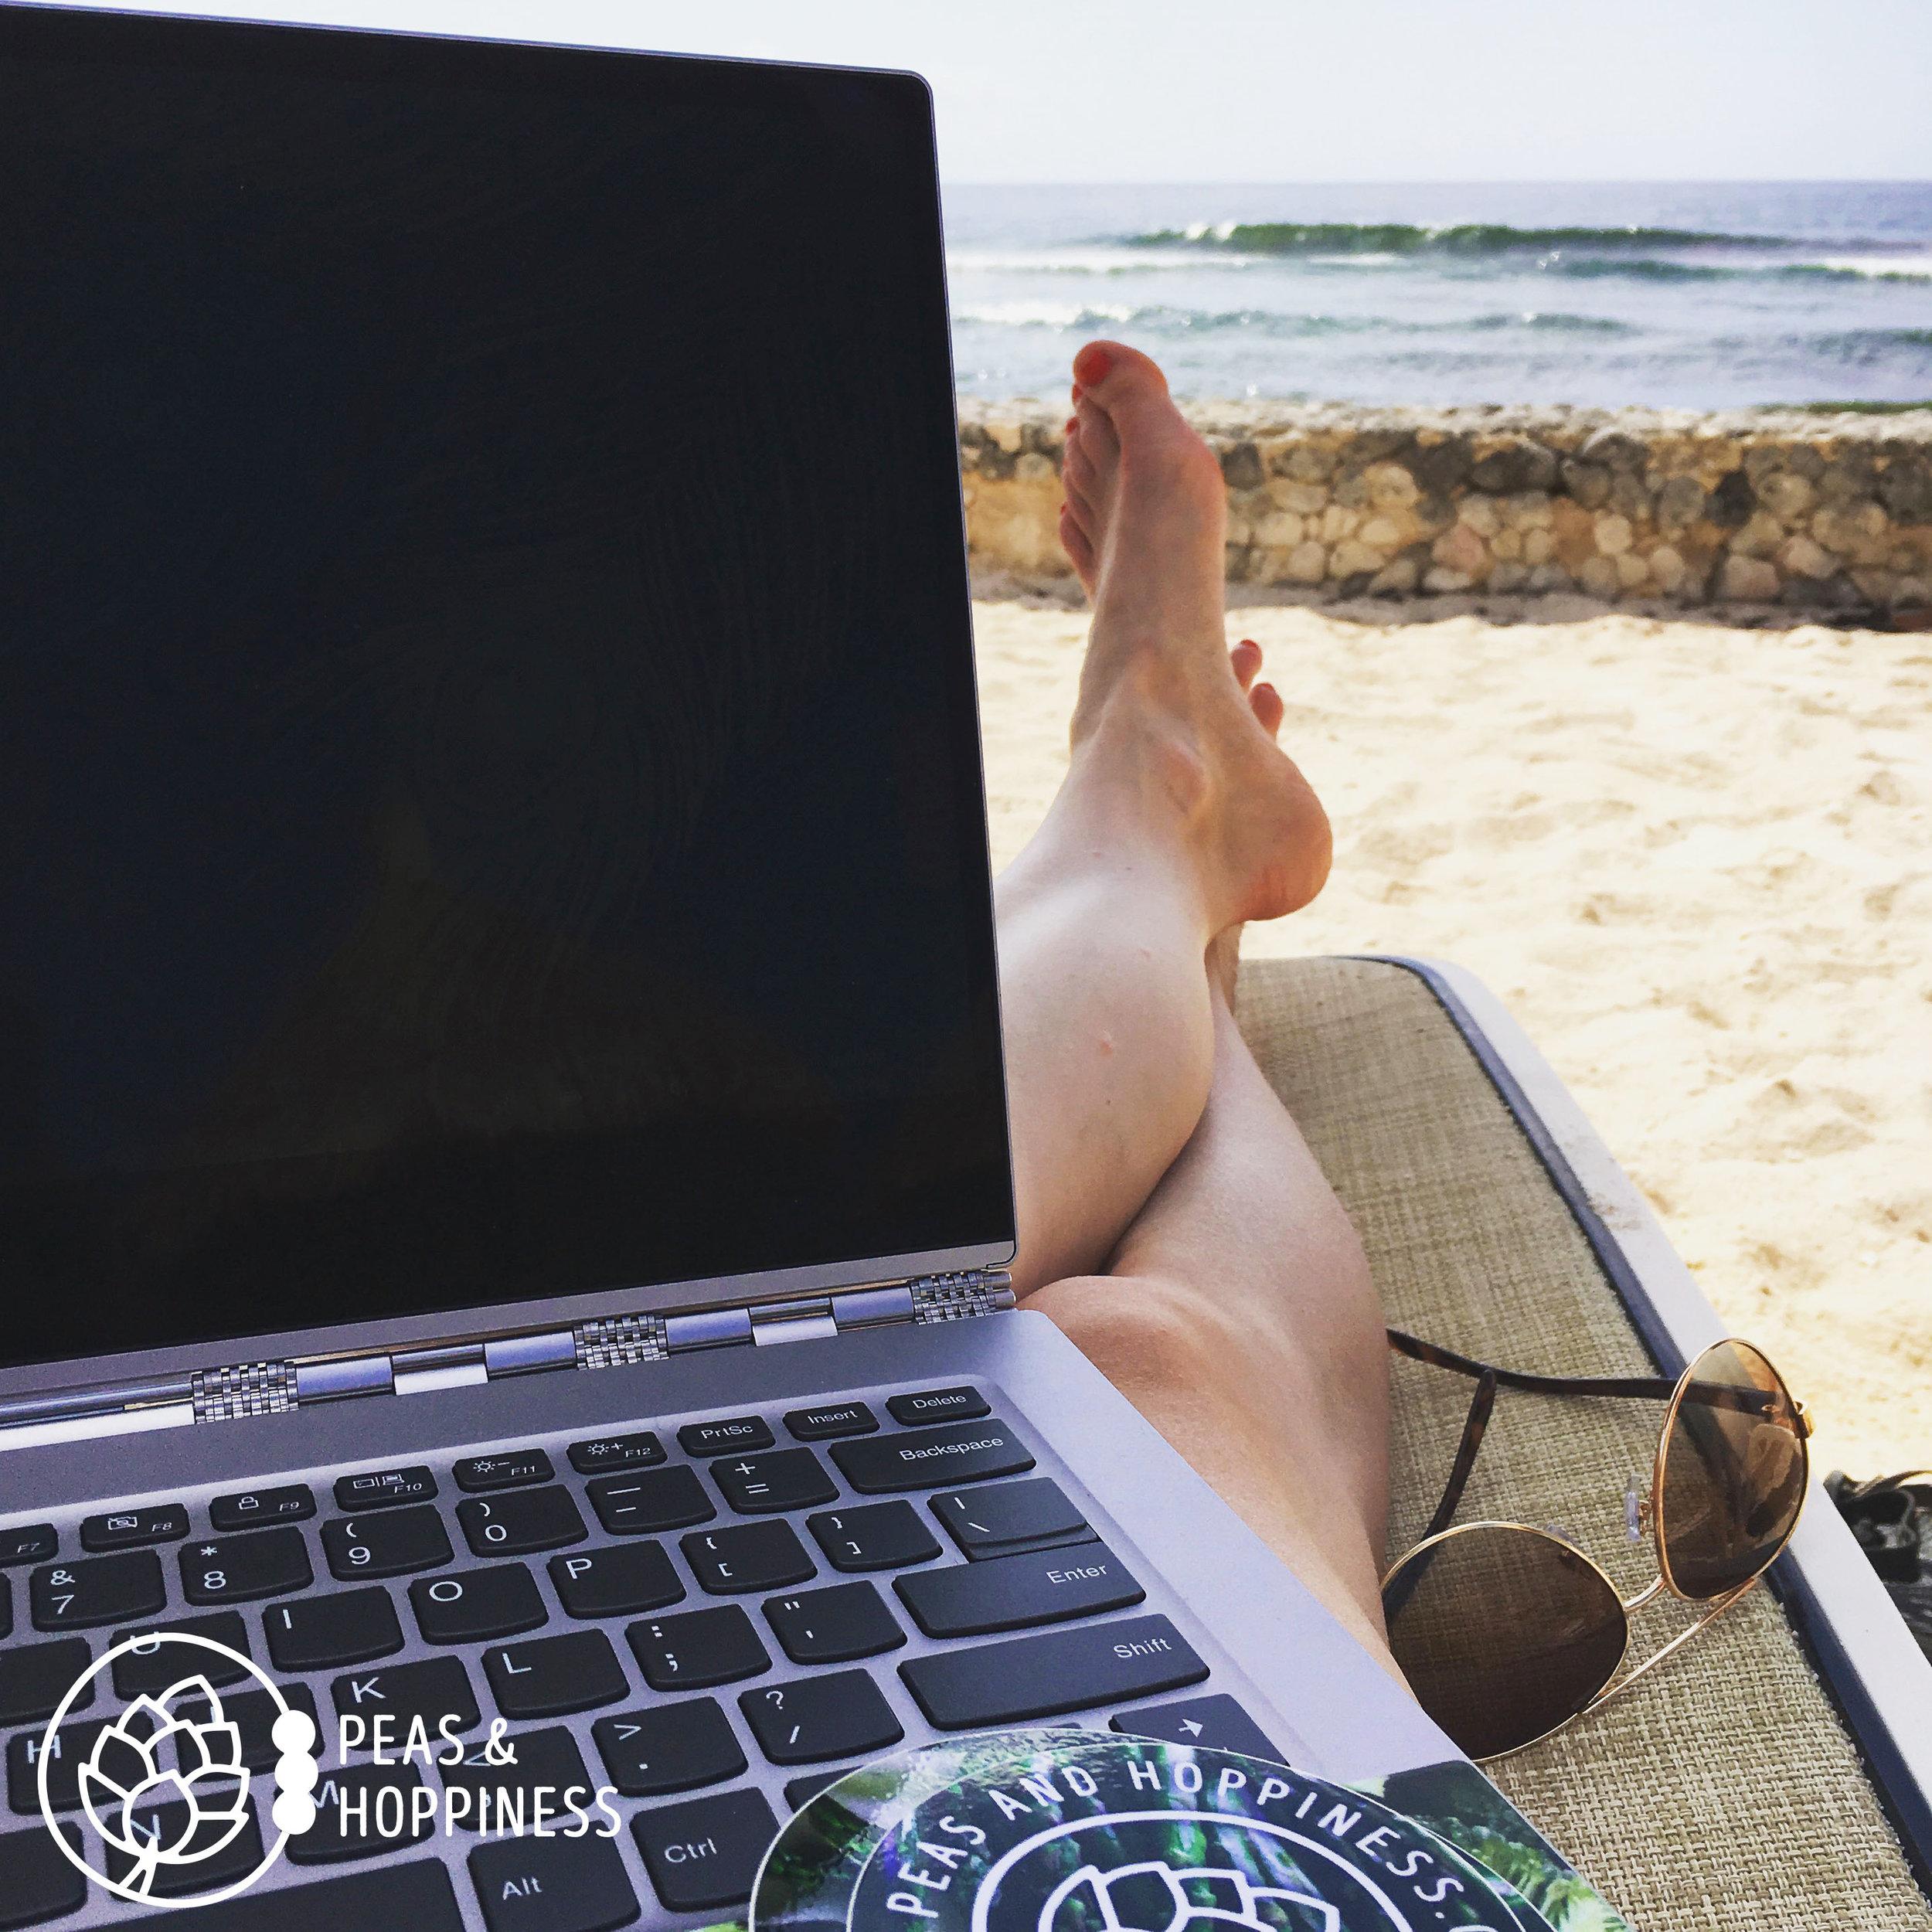 Beach-side Blogging